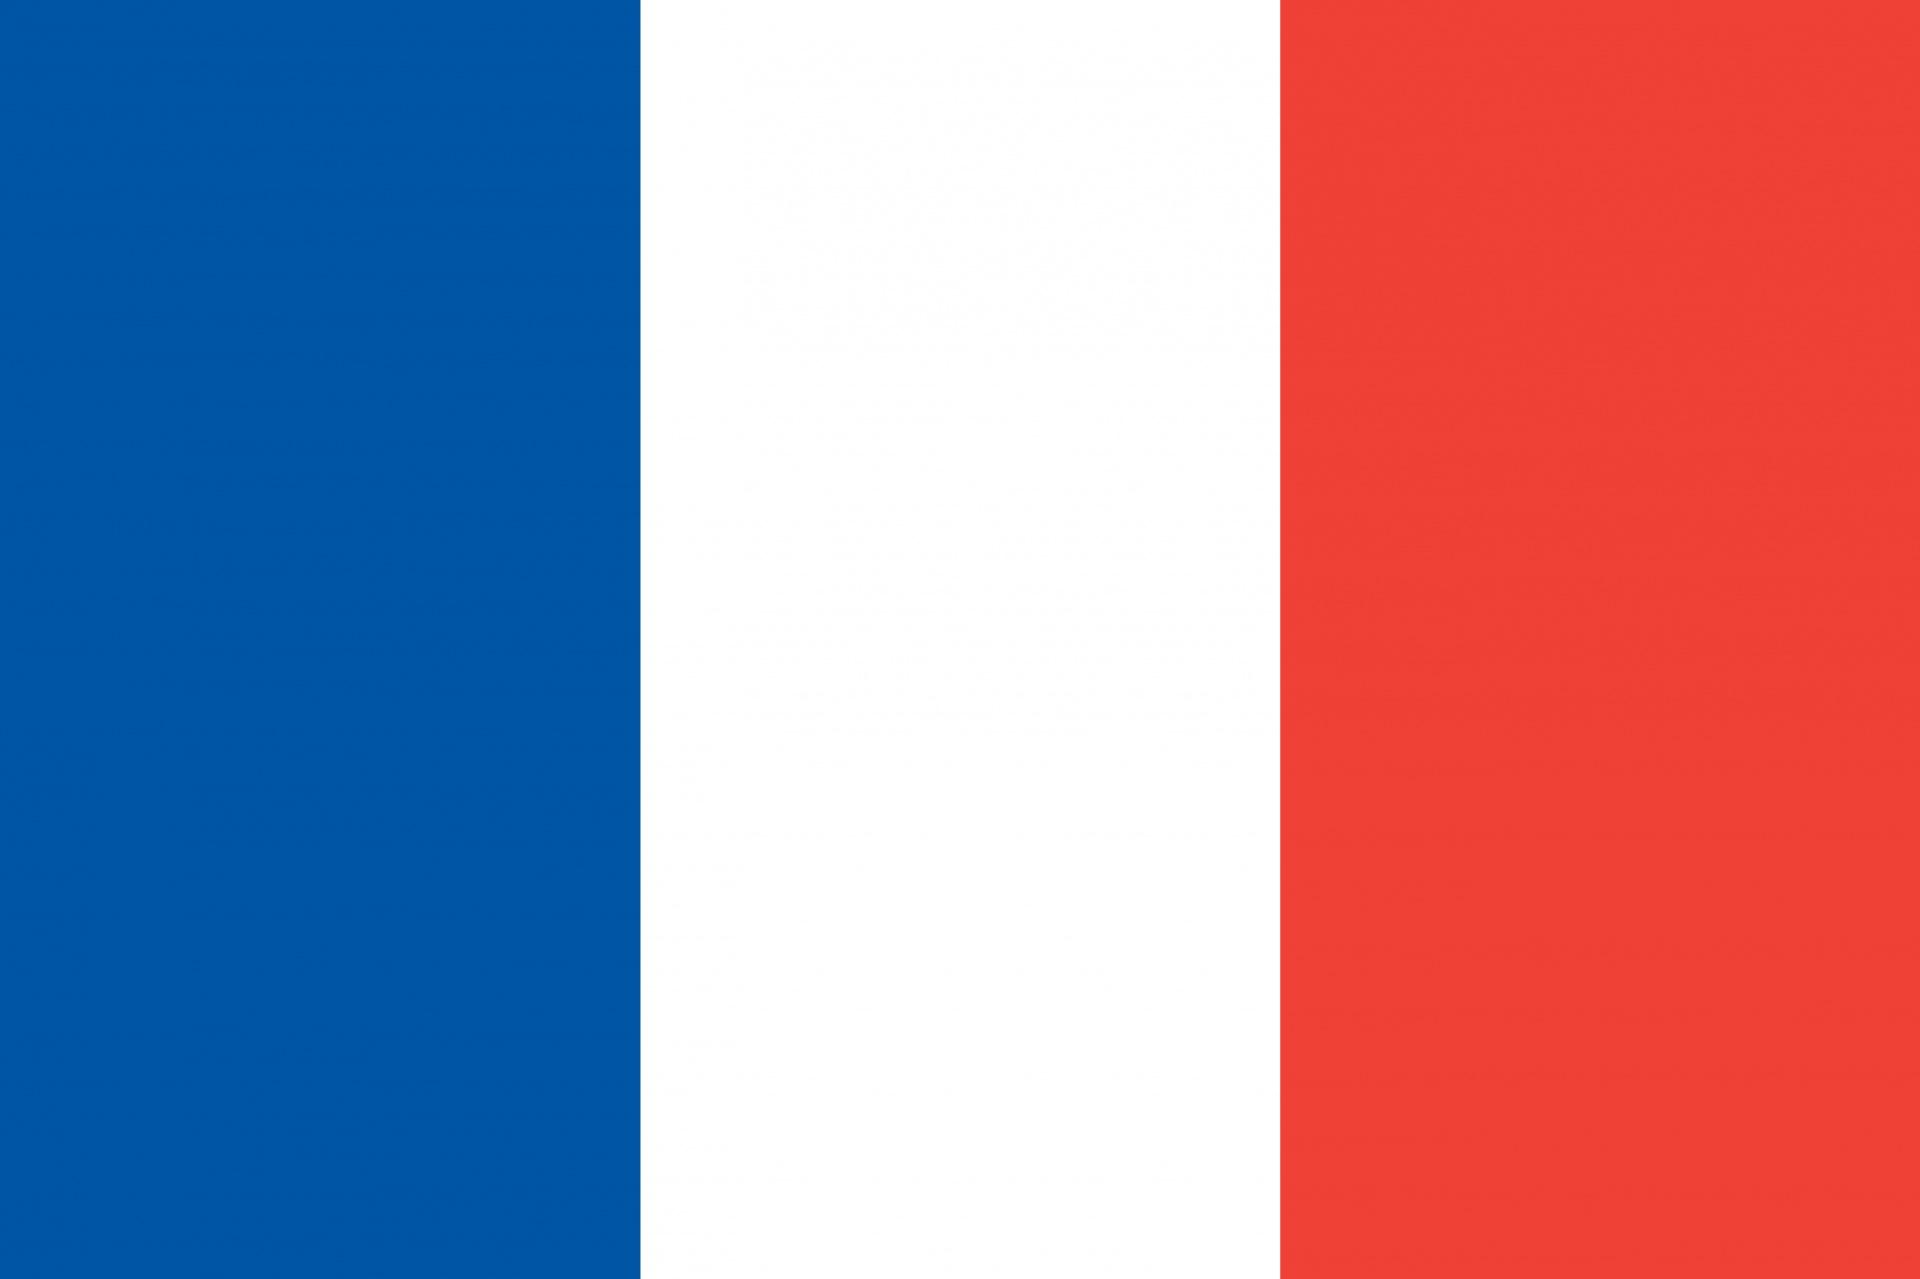 hymne national de la france drapeau